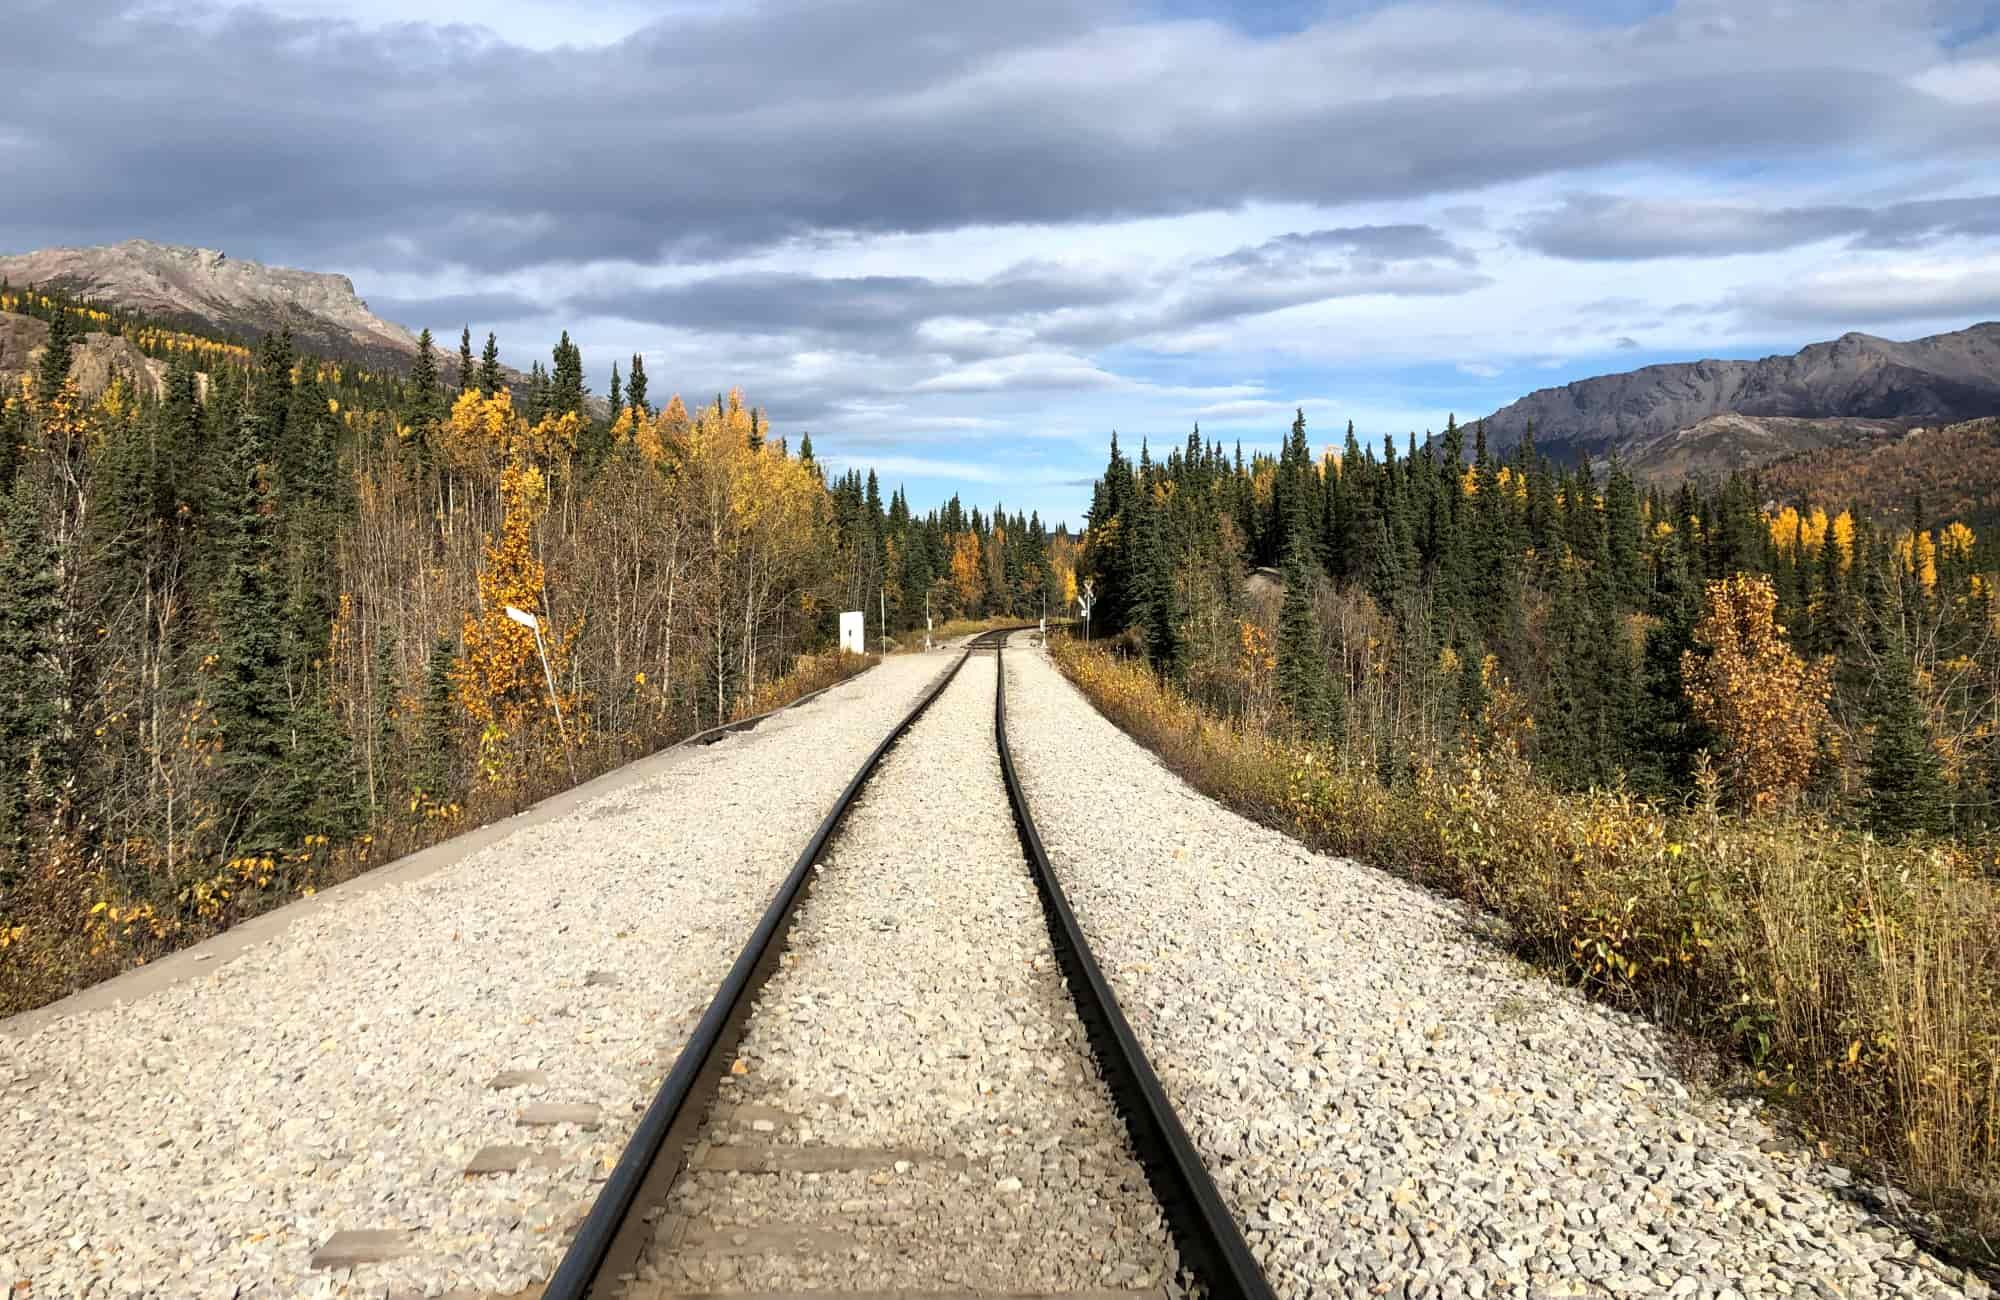 Voyage en Alaska - Parc National de Denali - Amplitudes